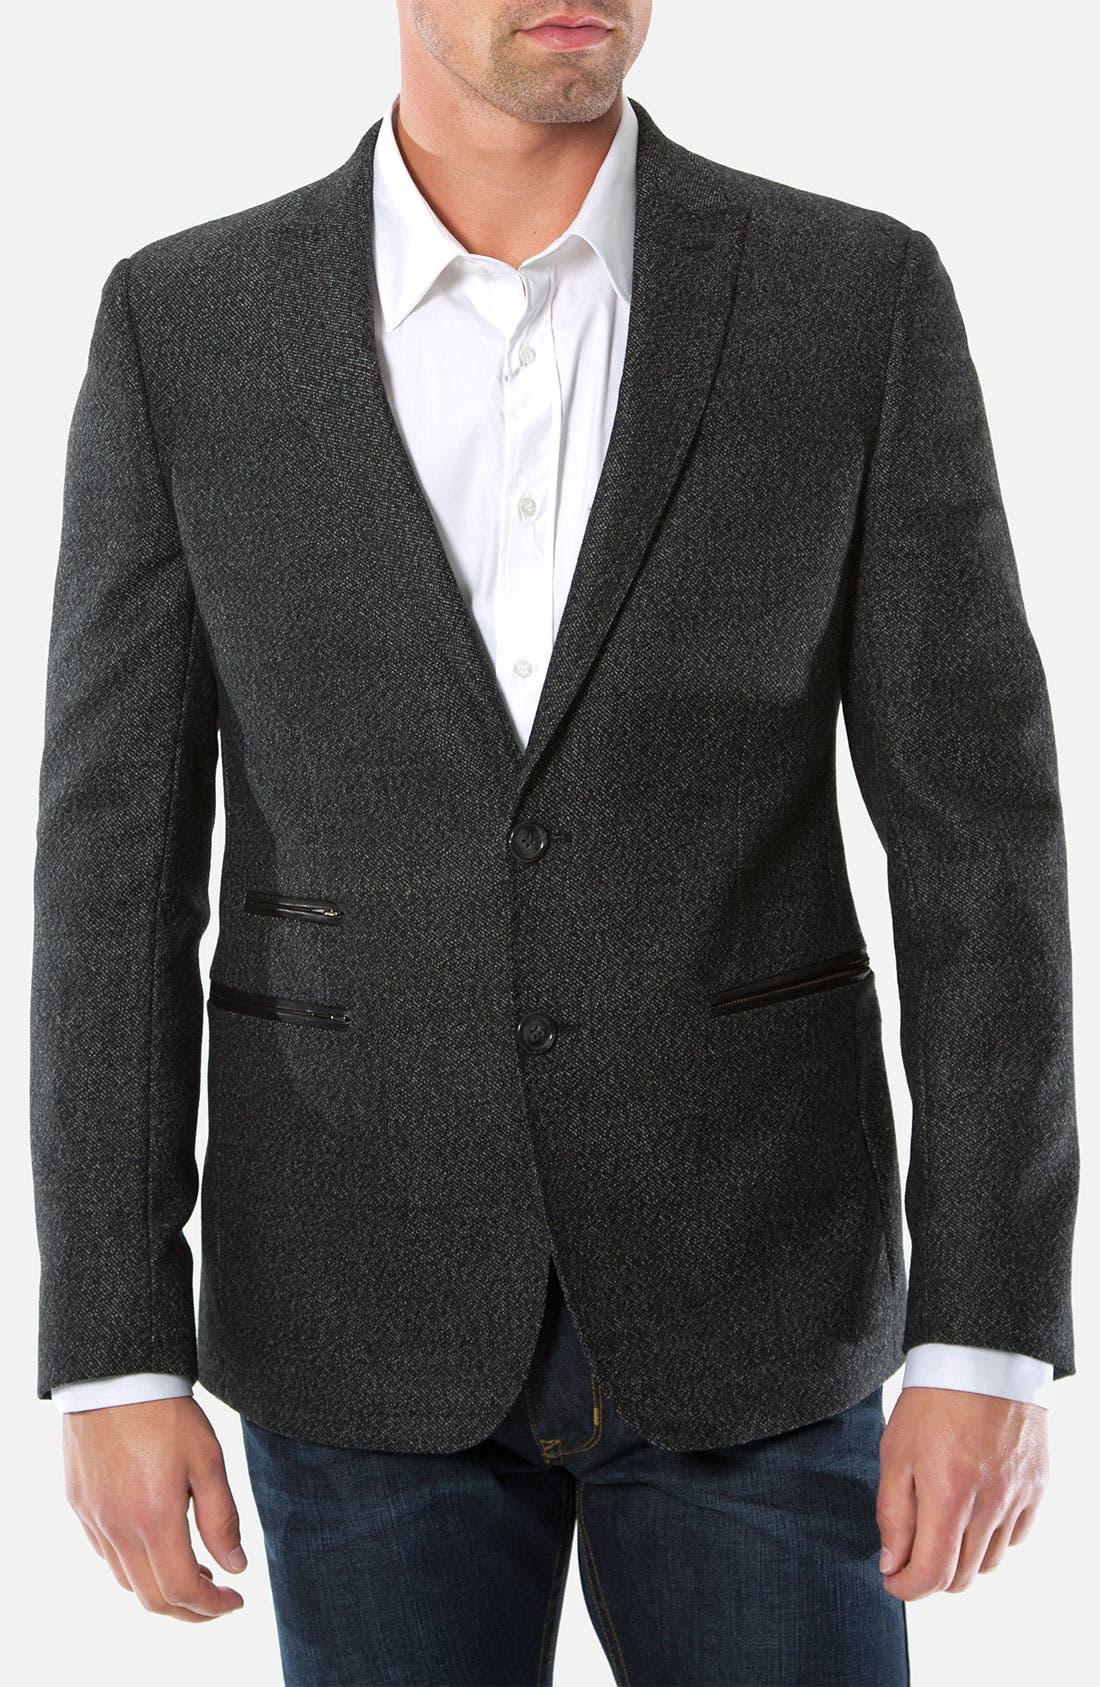 Main Image - 7 Diamonds 'Modena' Wool Blend Blazer